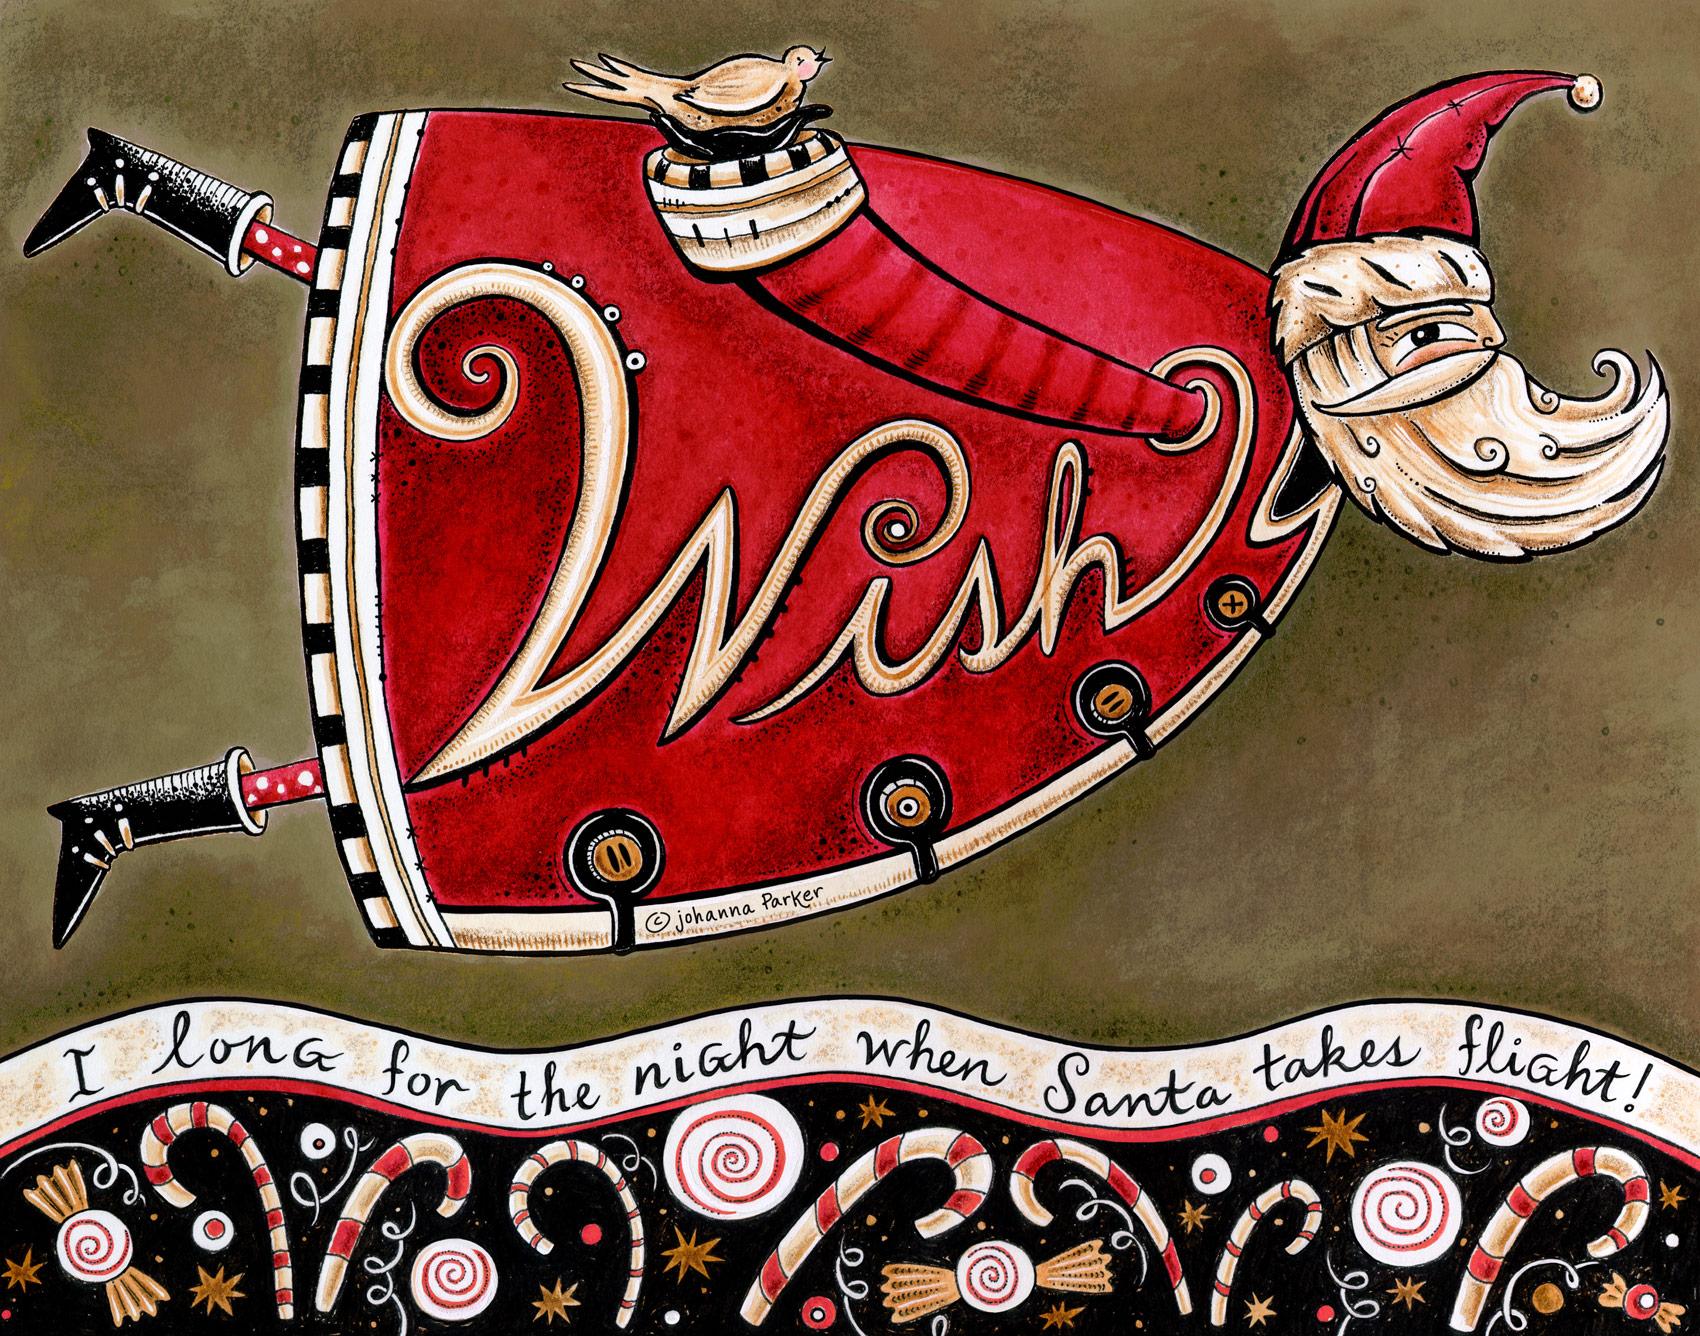 Wish Santa